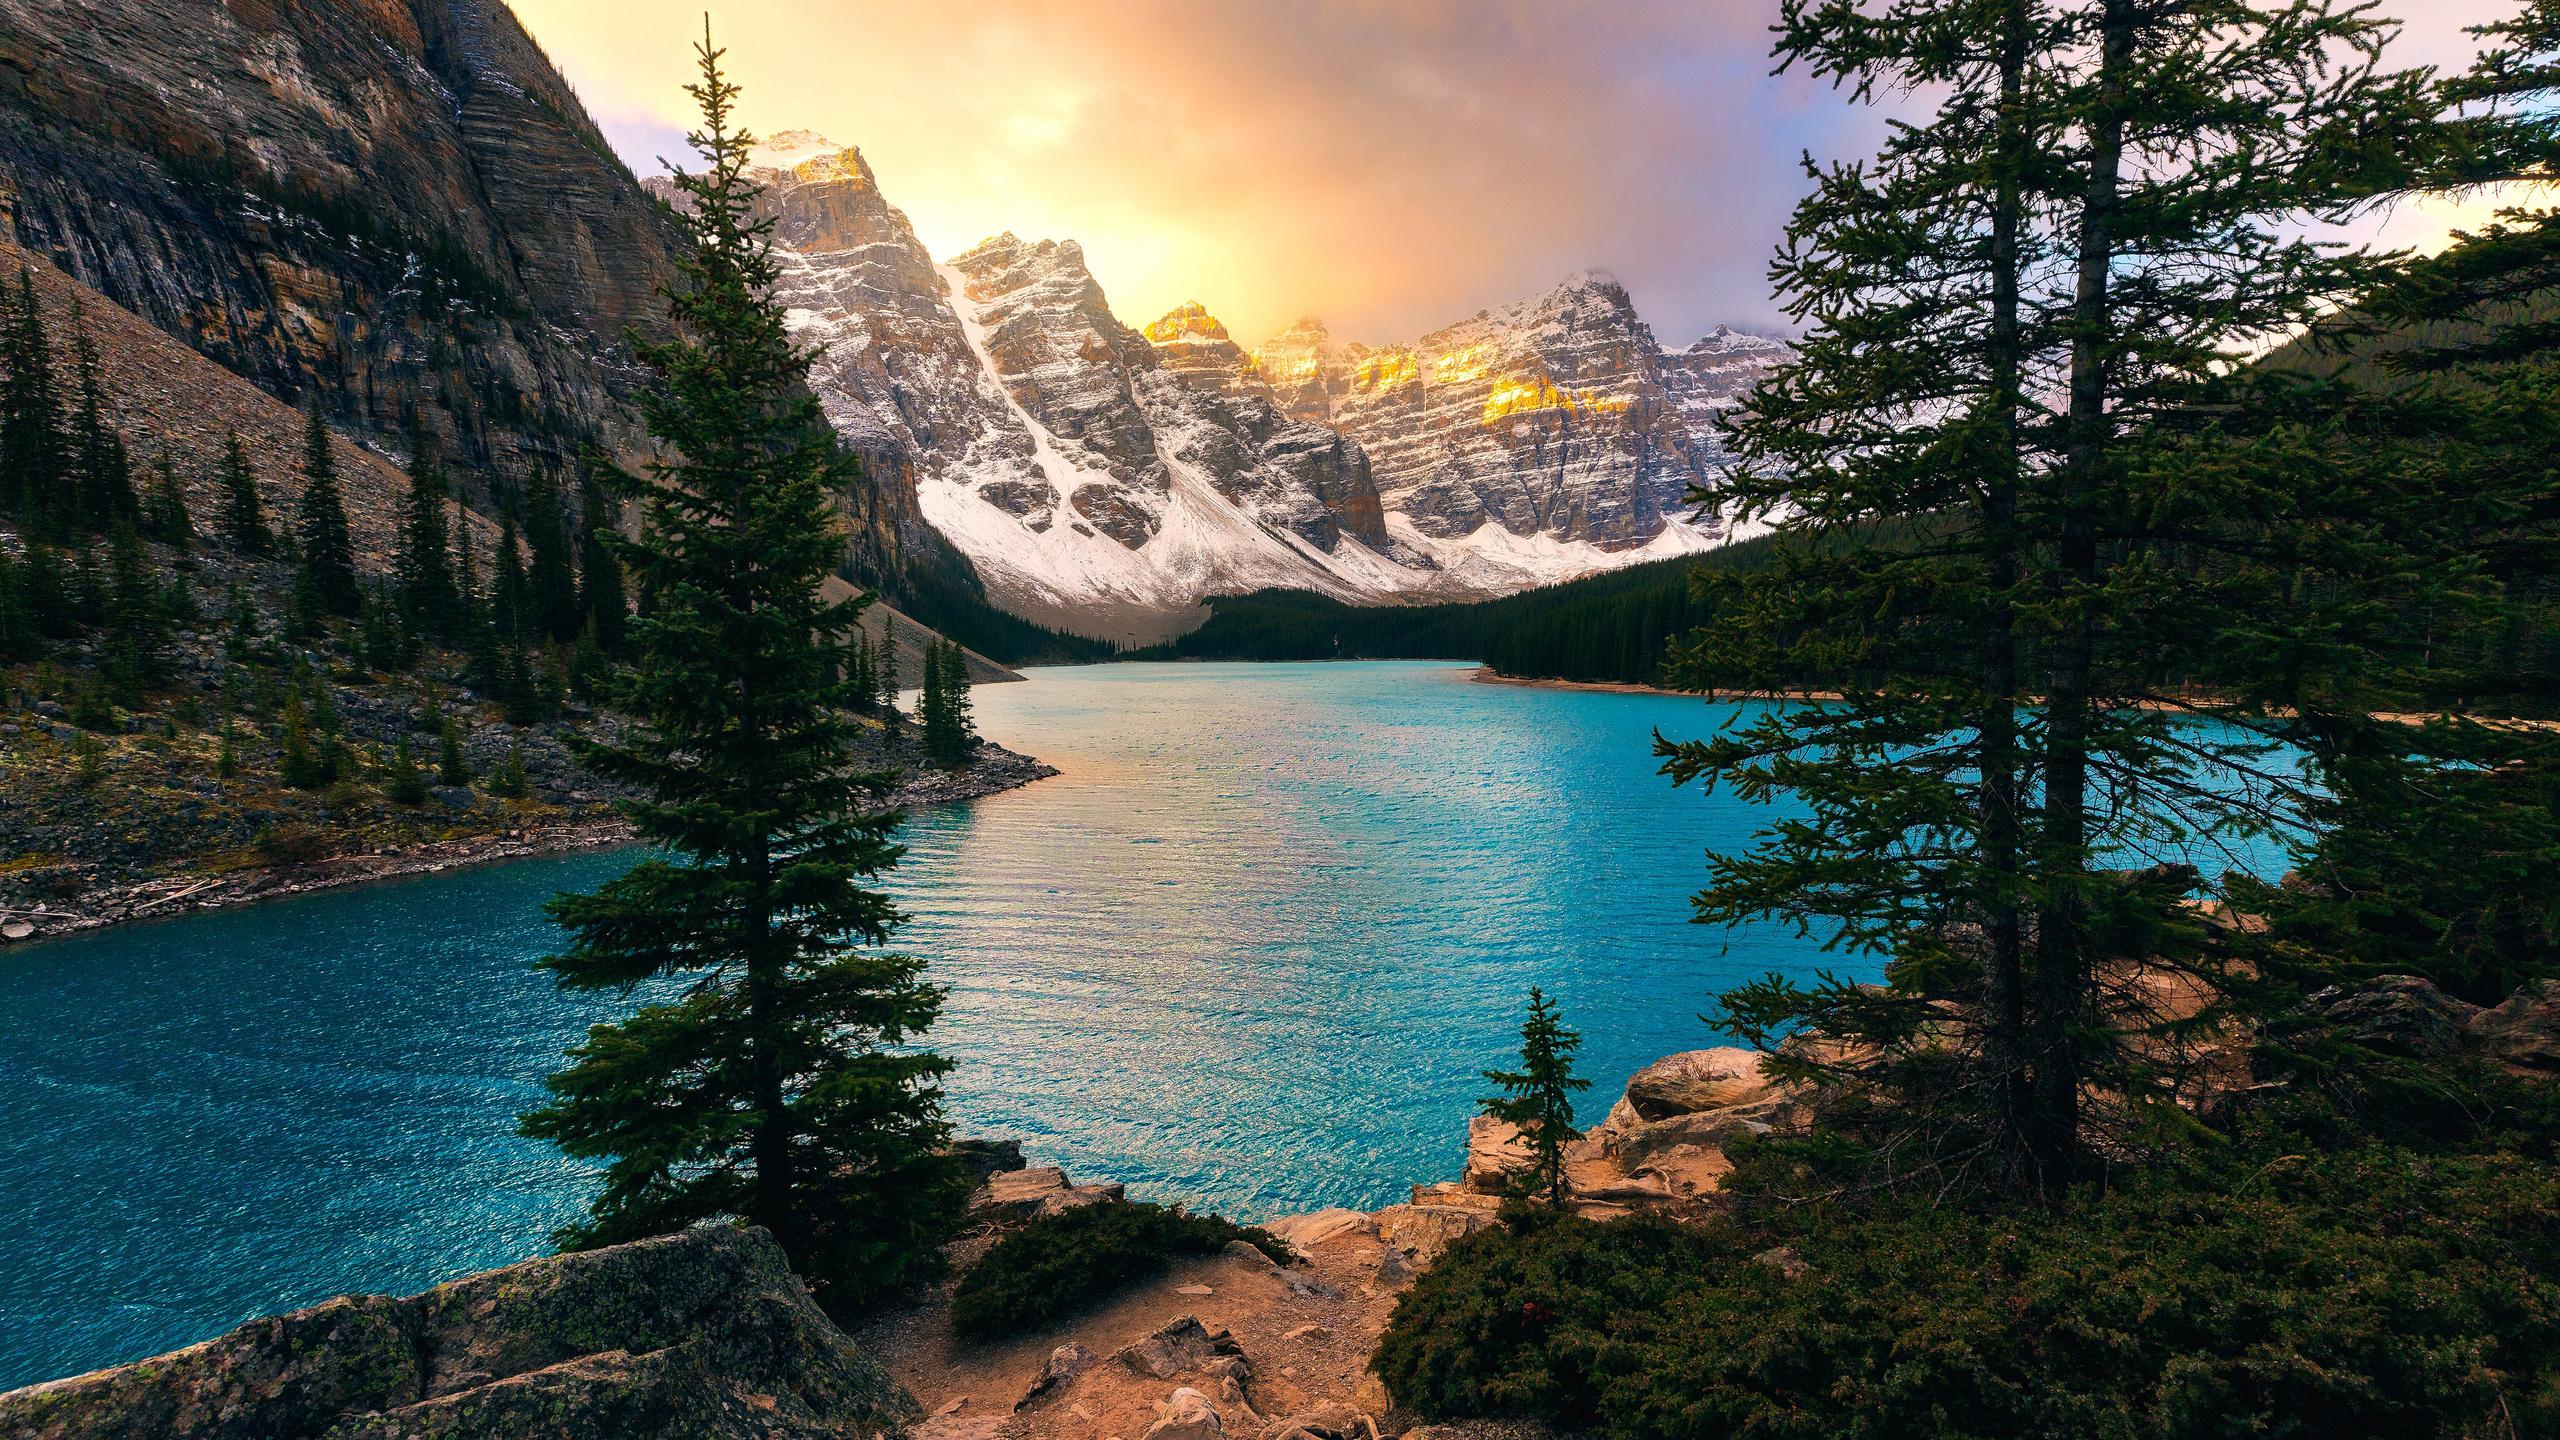 деревья, озеро, горы, скалы, природа, канада, альберта, морейн, trees, lake, mountains